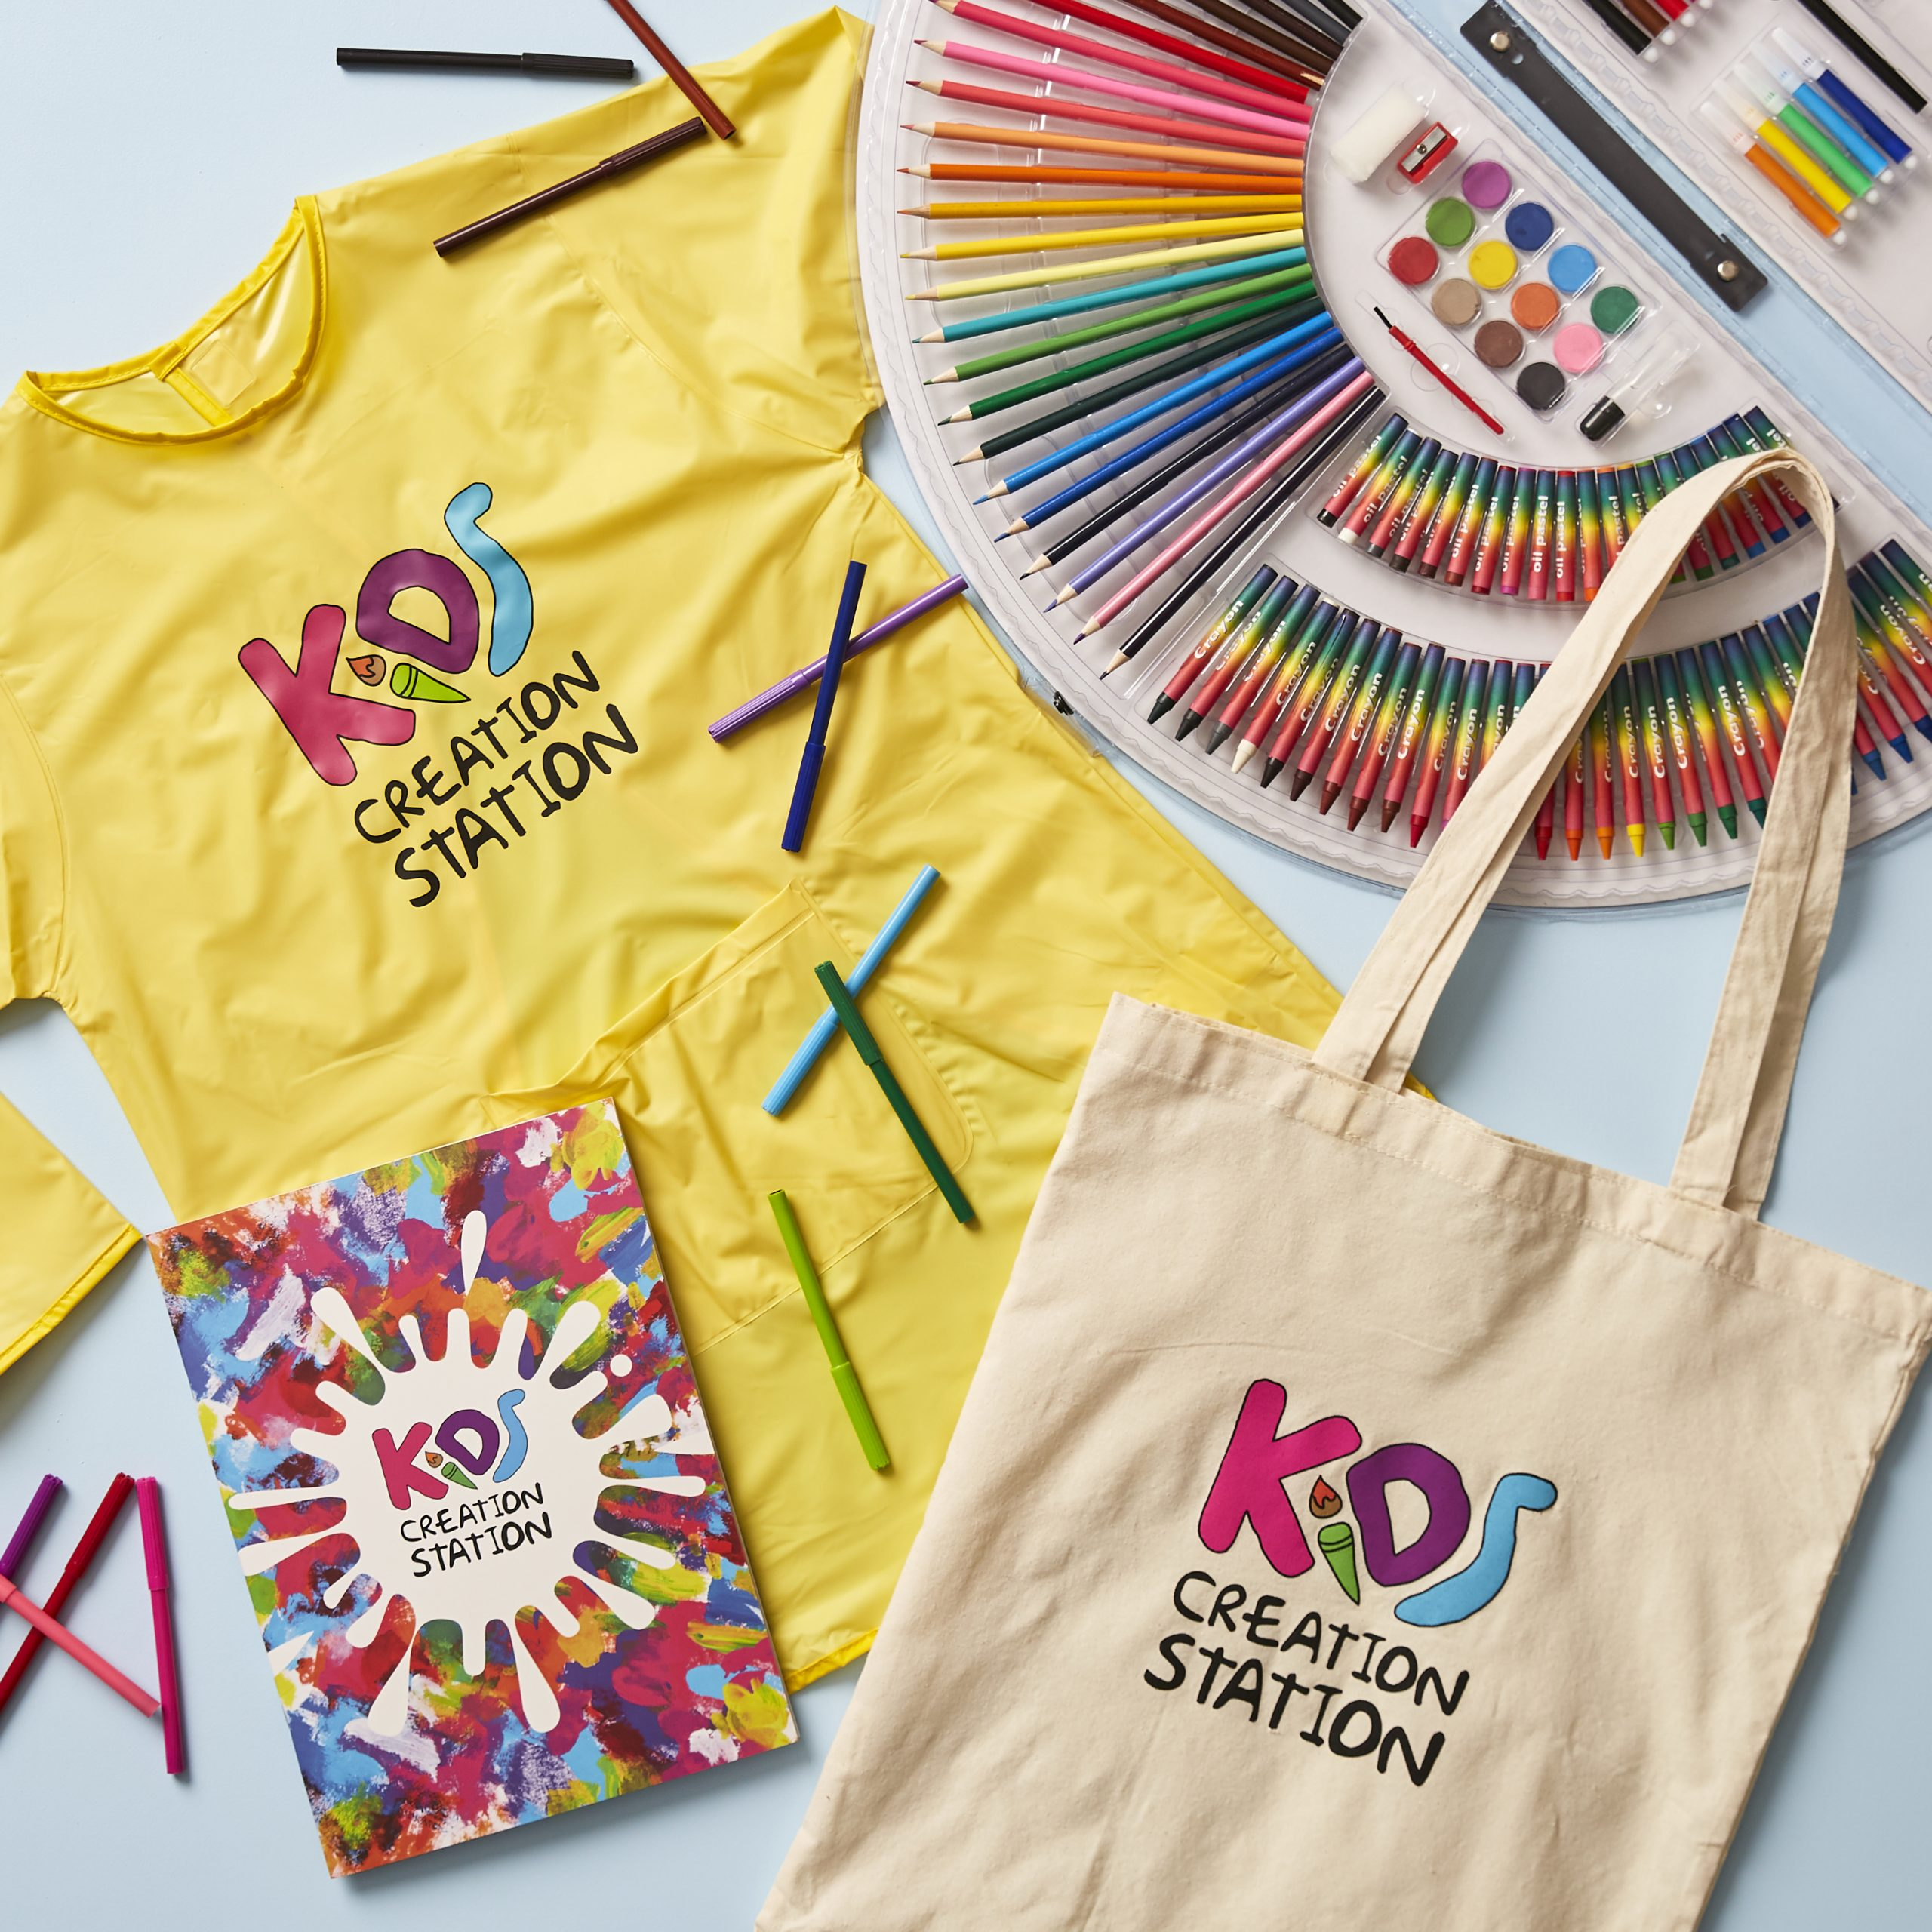 Kids_CreationStation_2020_2